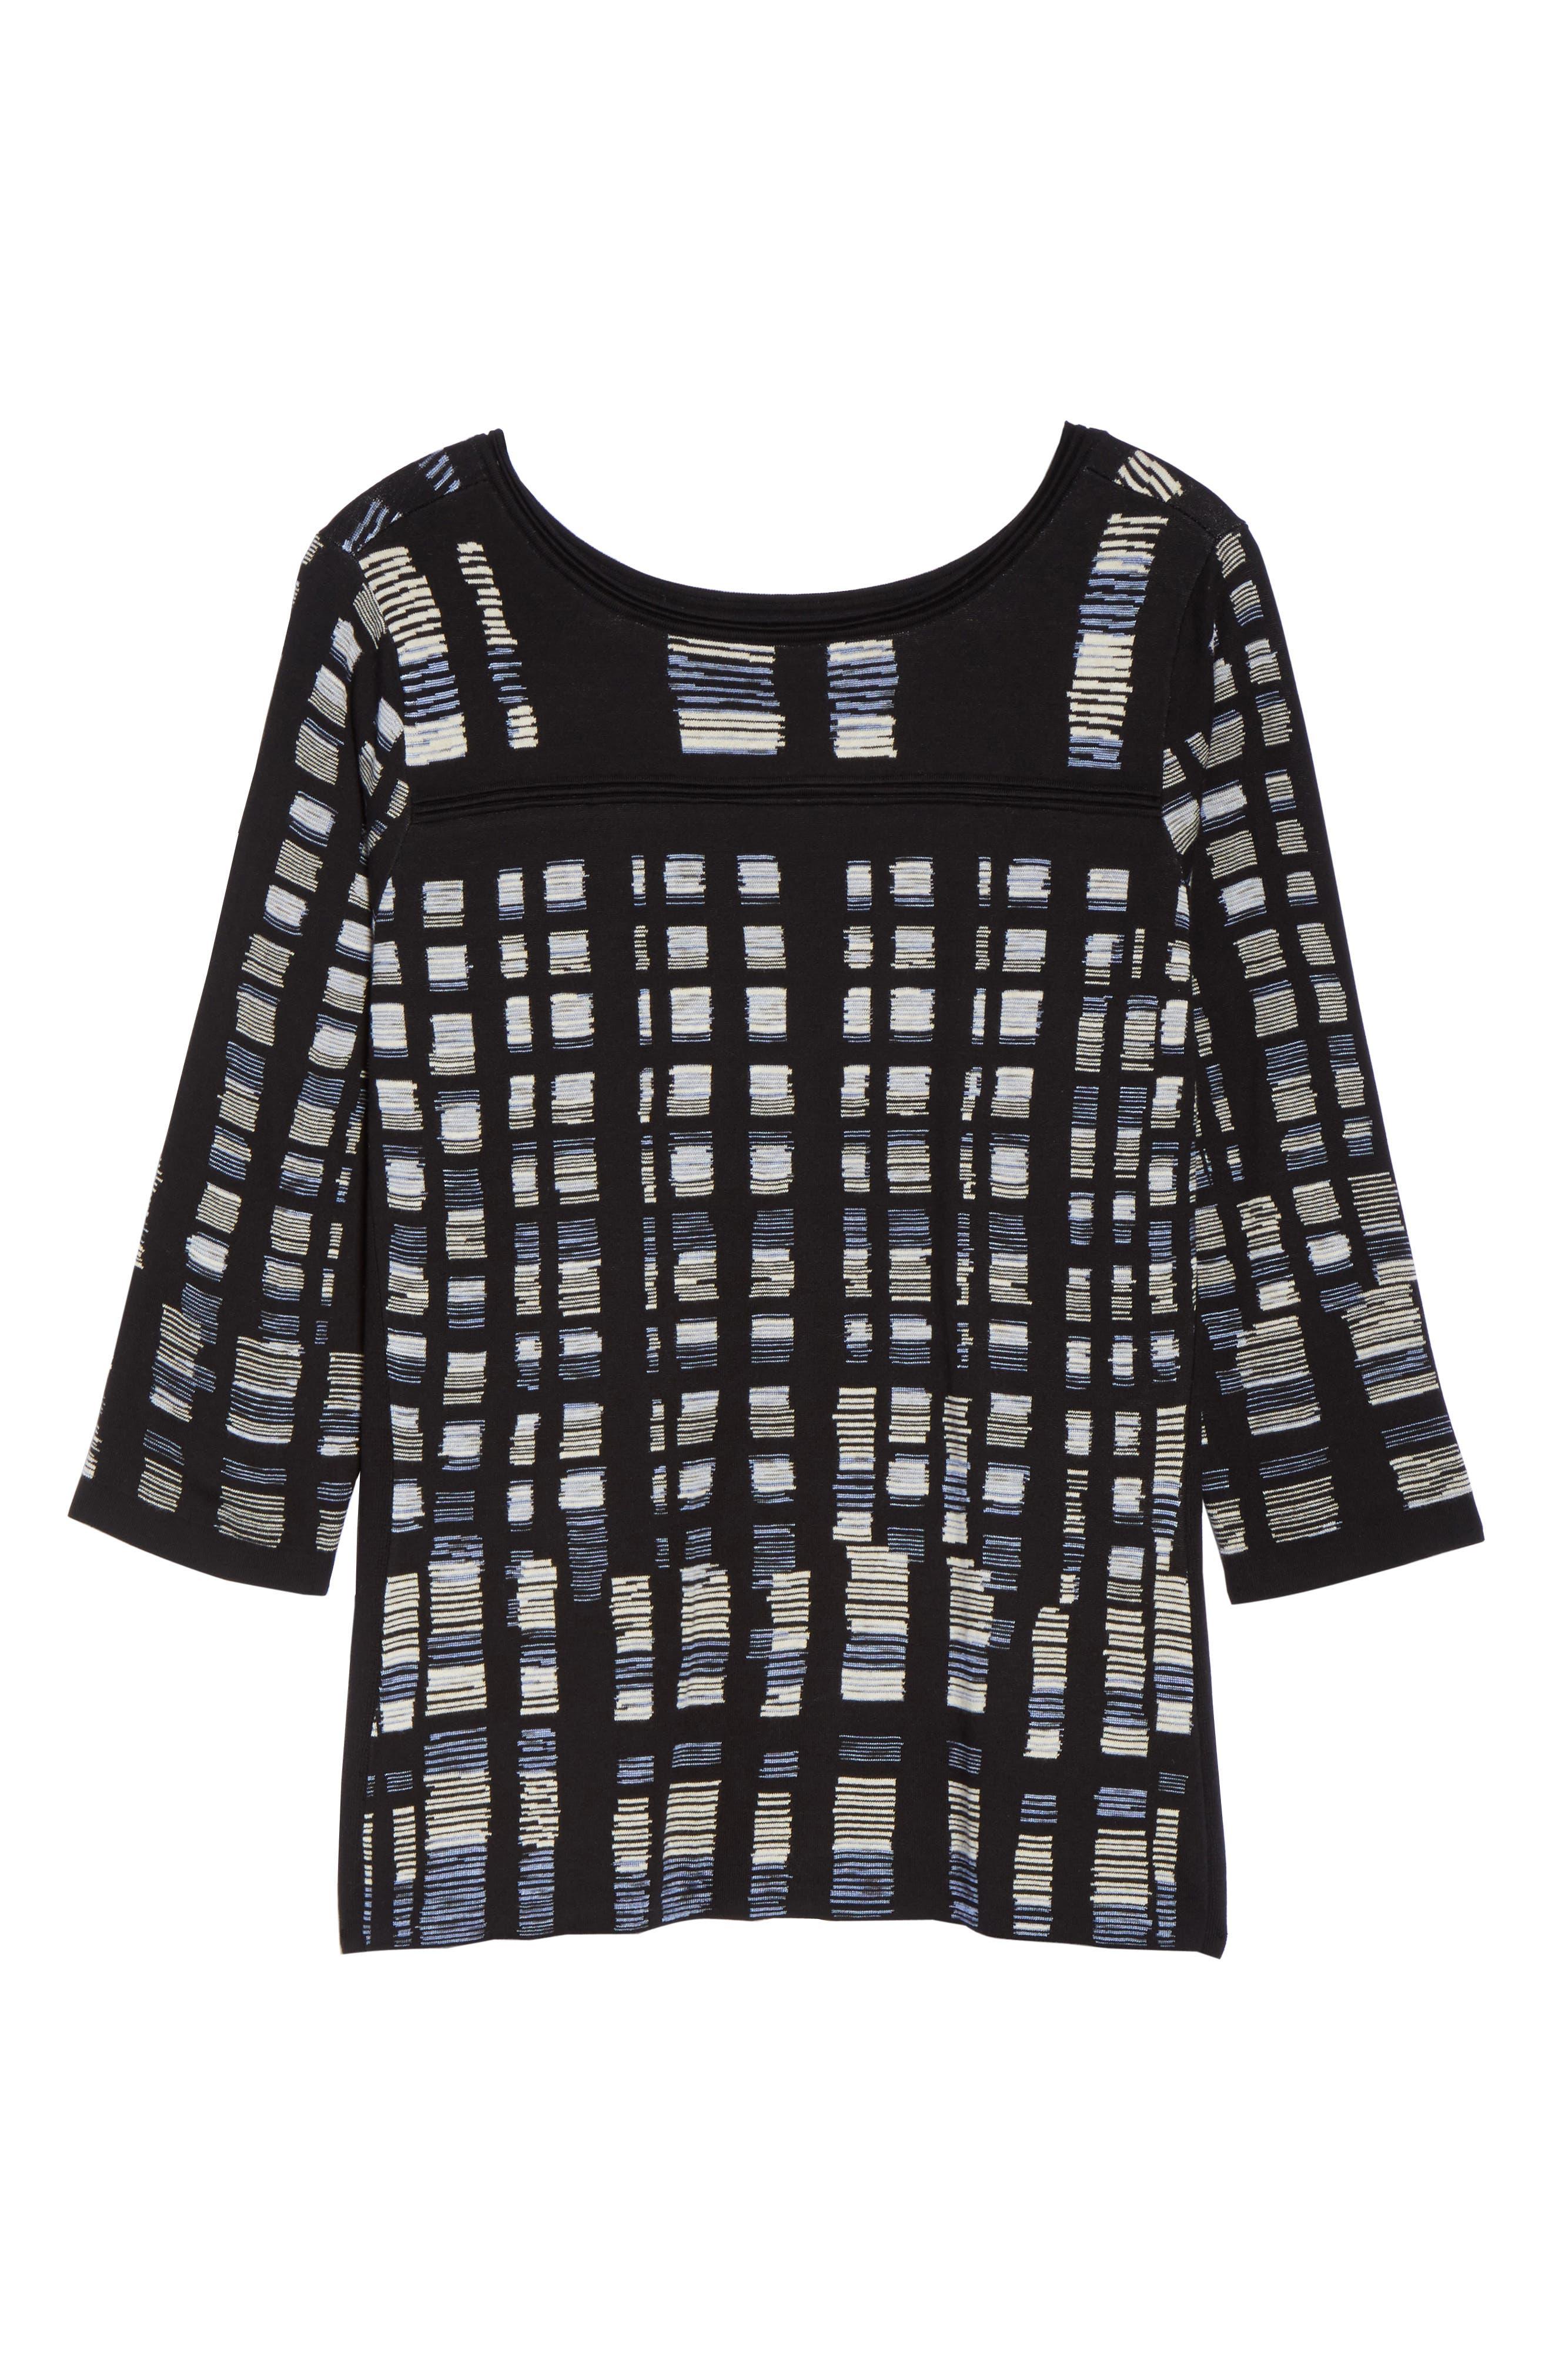 Crystal Cove Sweater,                             Alternate thumbnail 6, color,                             Black Multi